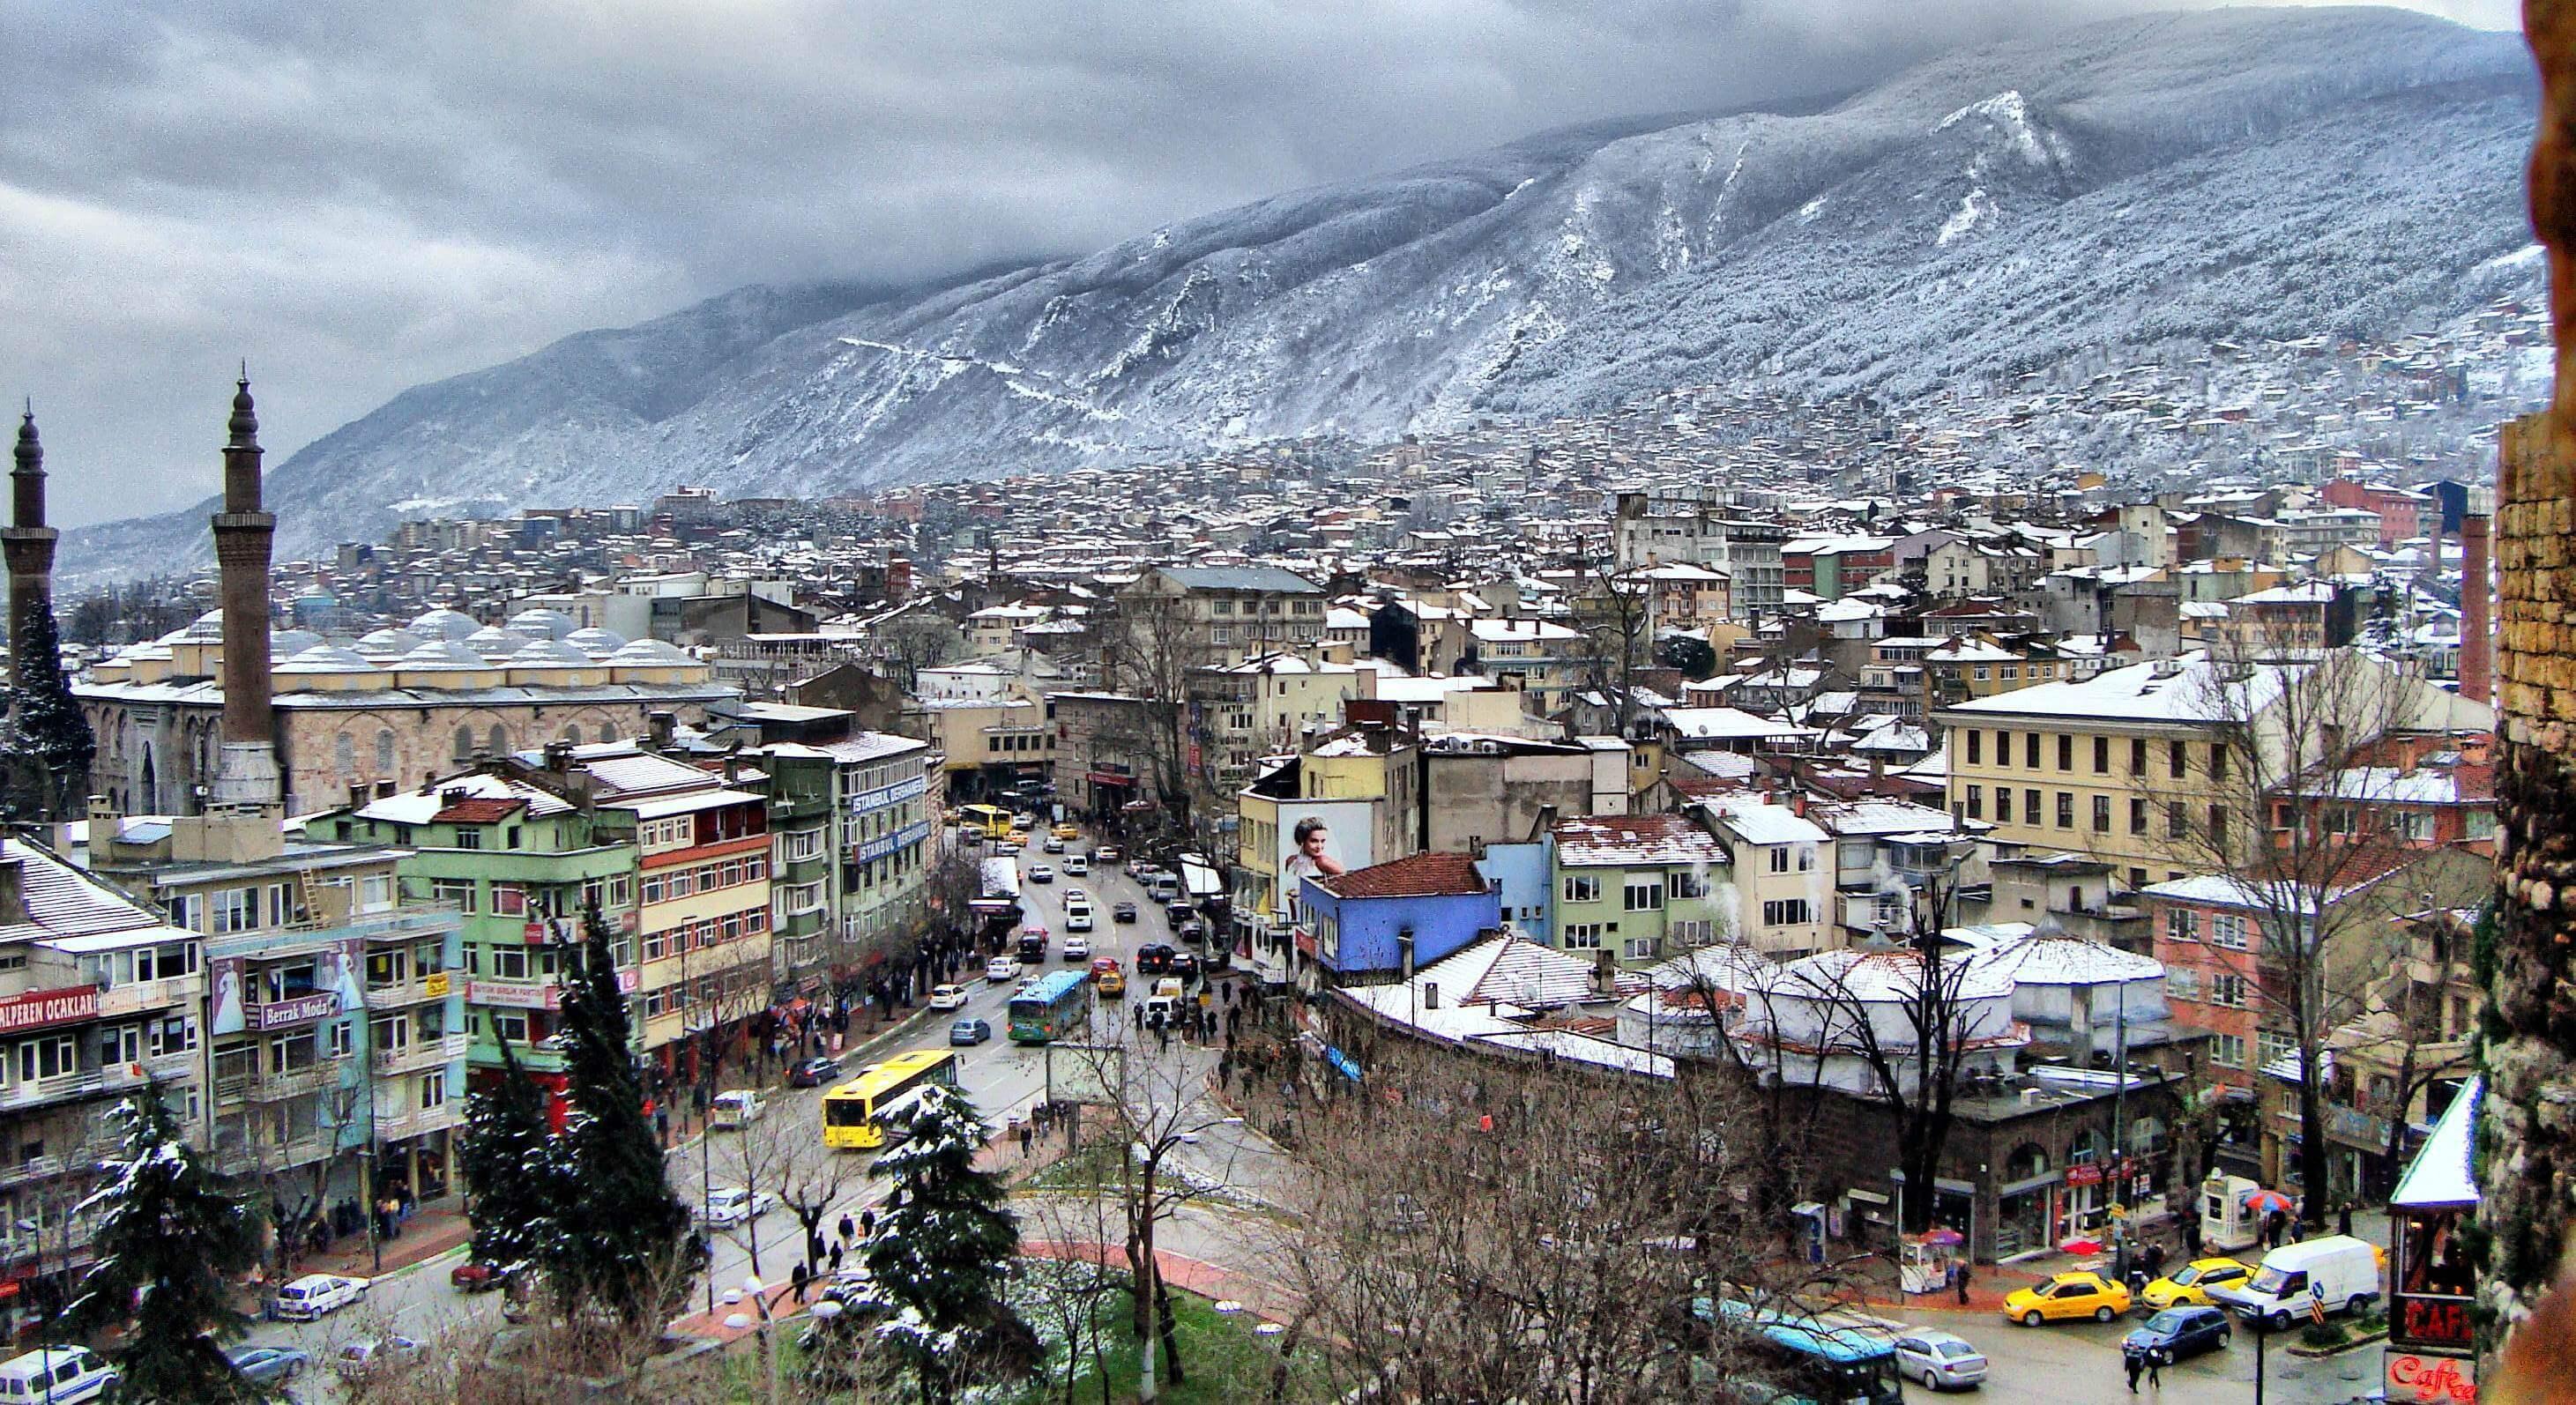 BURSA INDUSTRIAL KEY ROLE IN TURKEYS ECONOMY